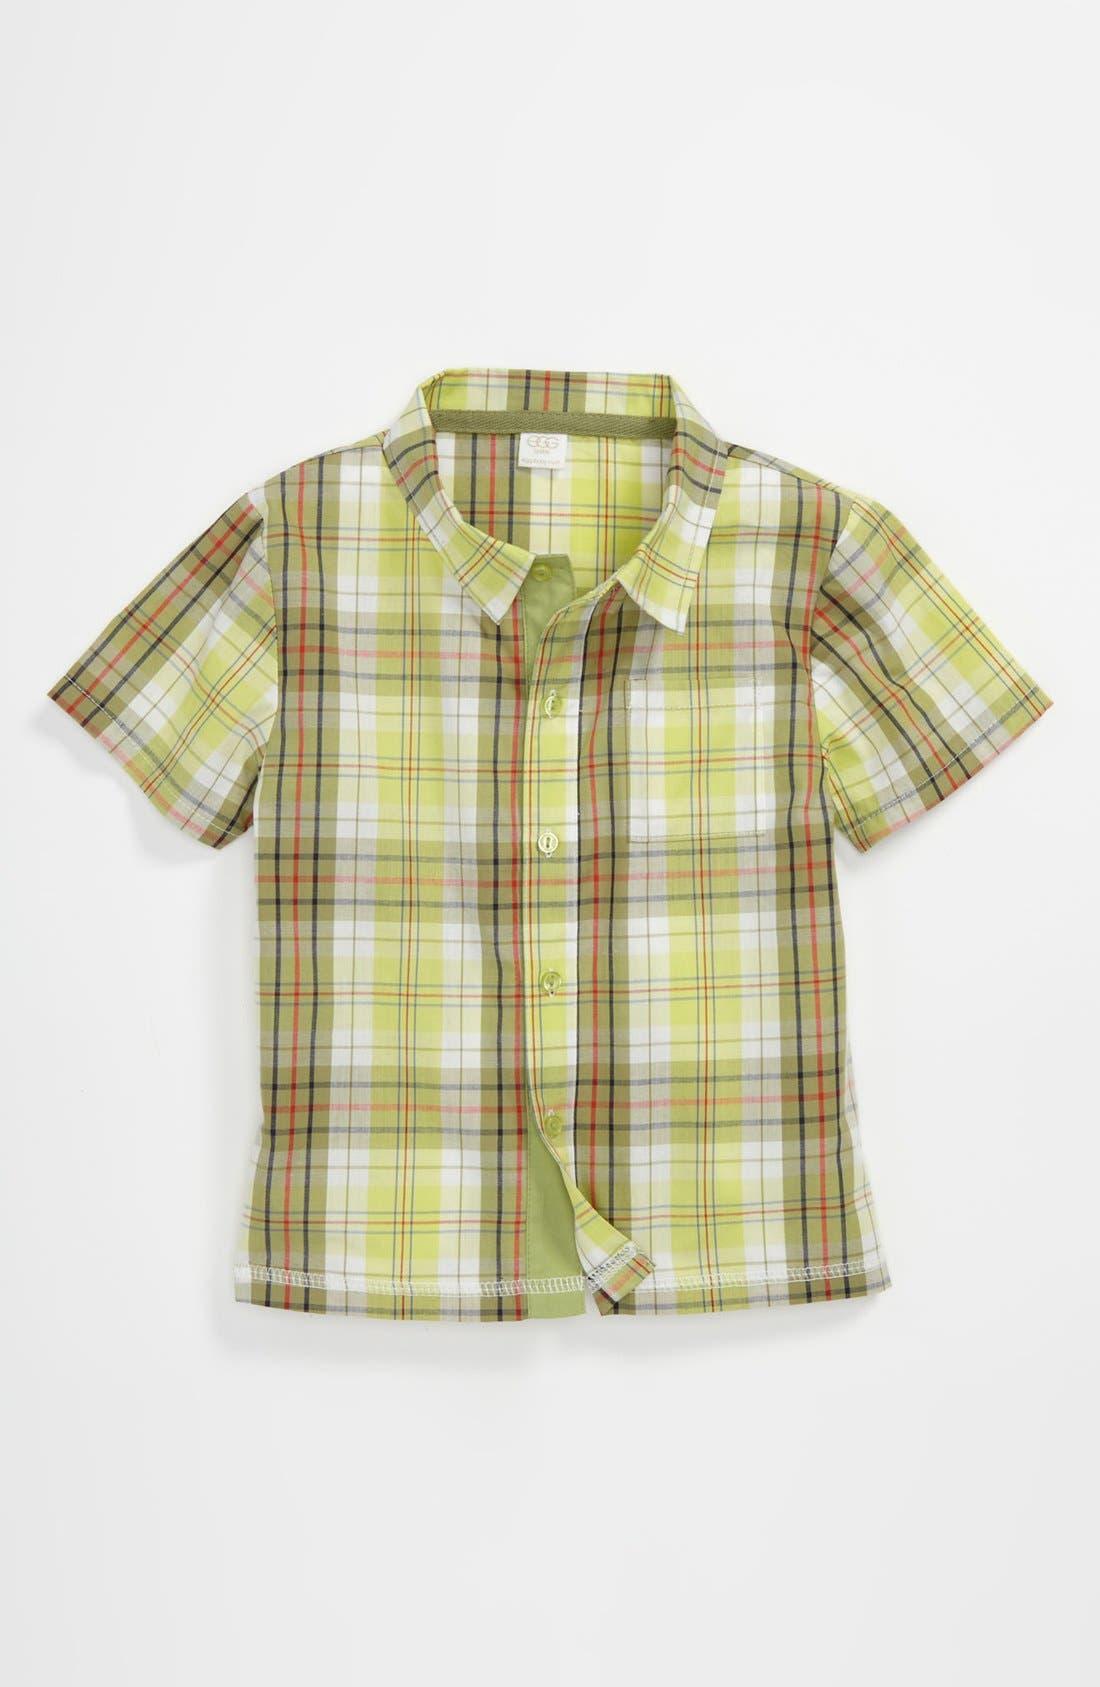 Alternate Image 1 Selected - egg by susan lazar Woven Shirt (Toddler)